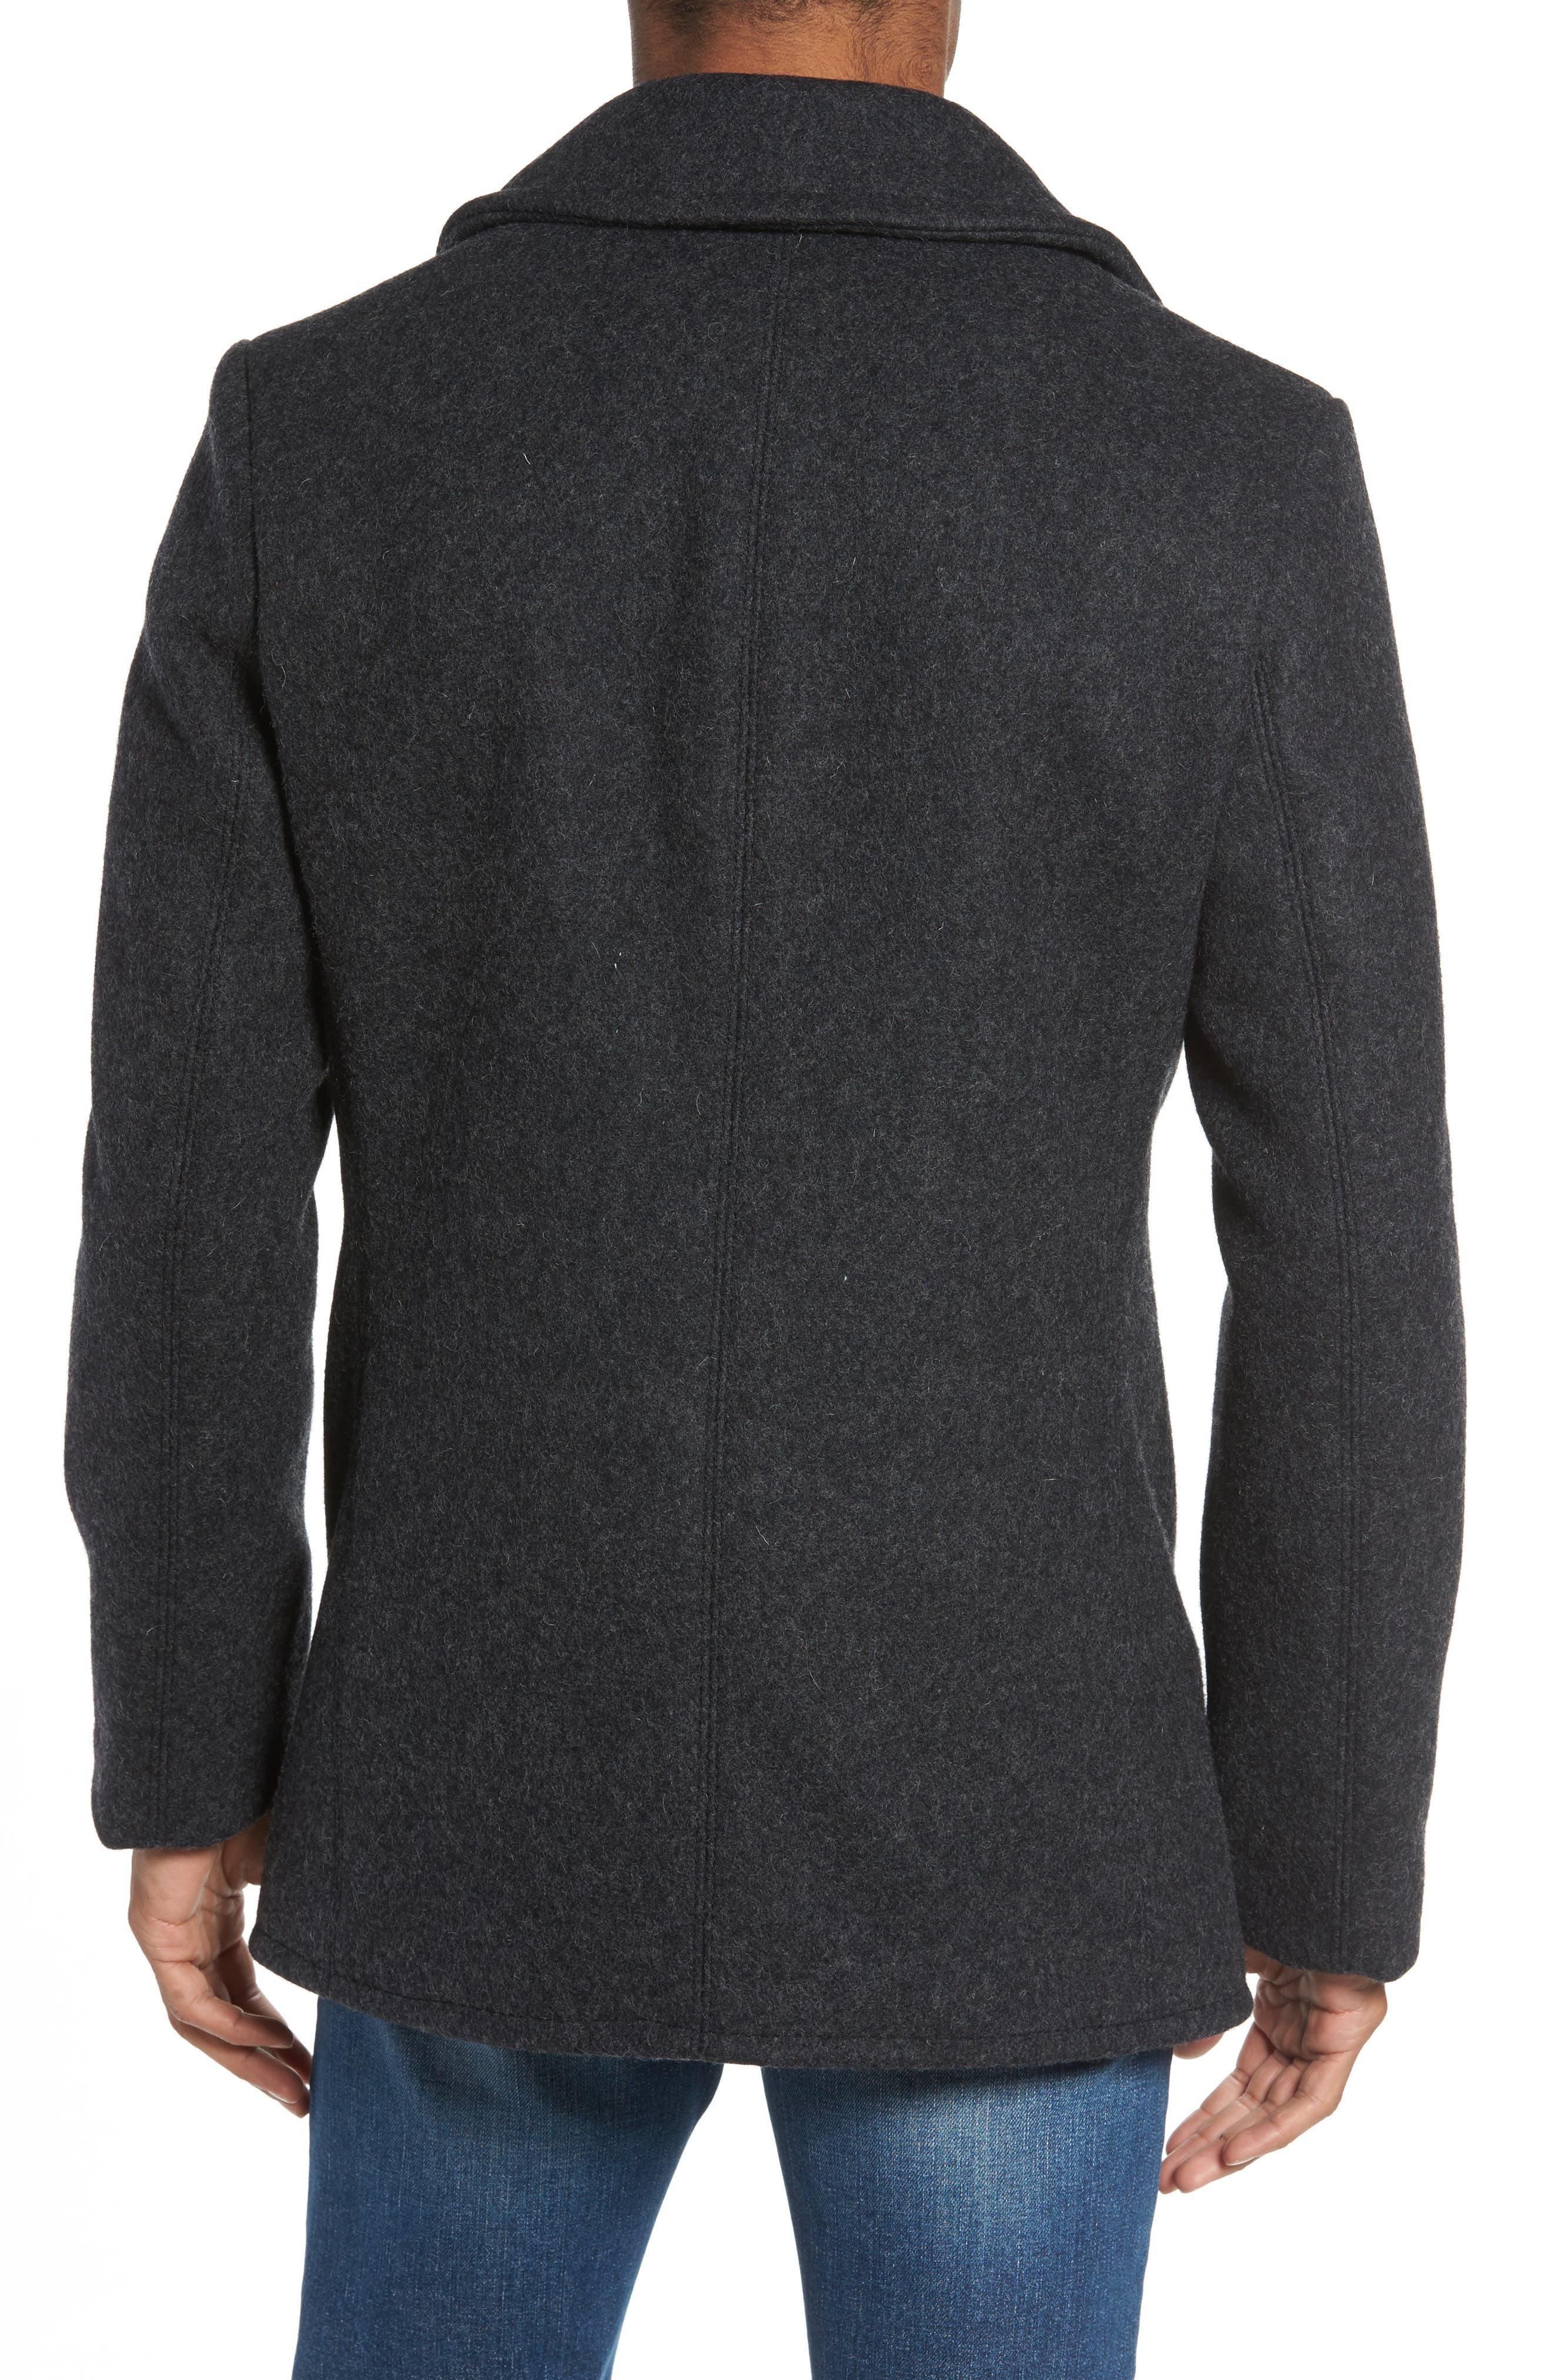 Slim Fit Melton Wool Blend Peacoat,                             Alternate thumbnail 2, color,                             022